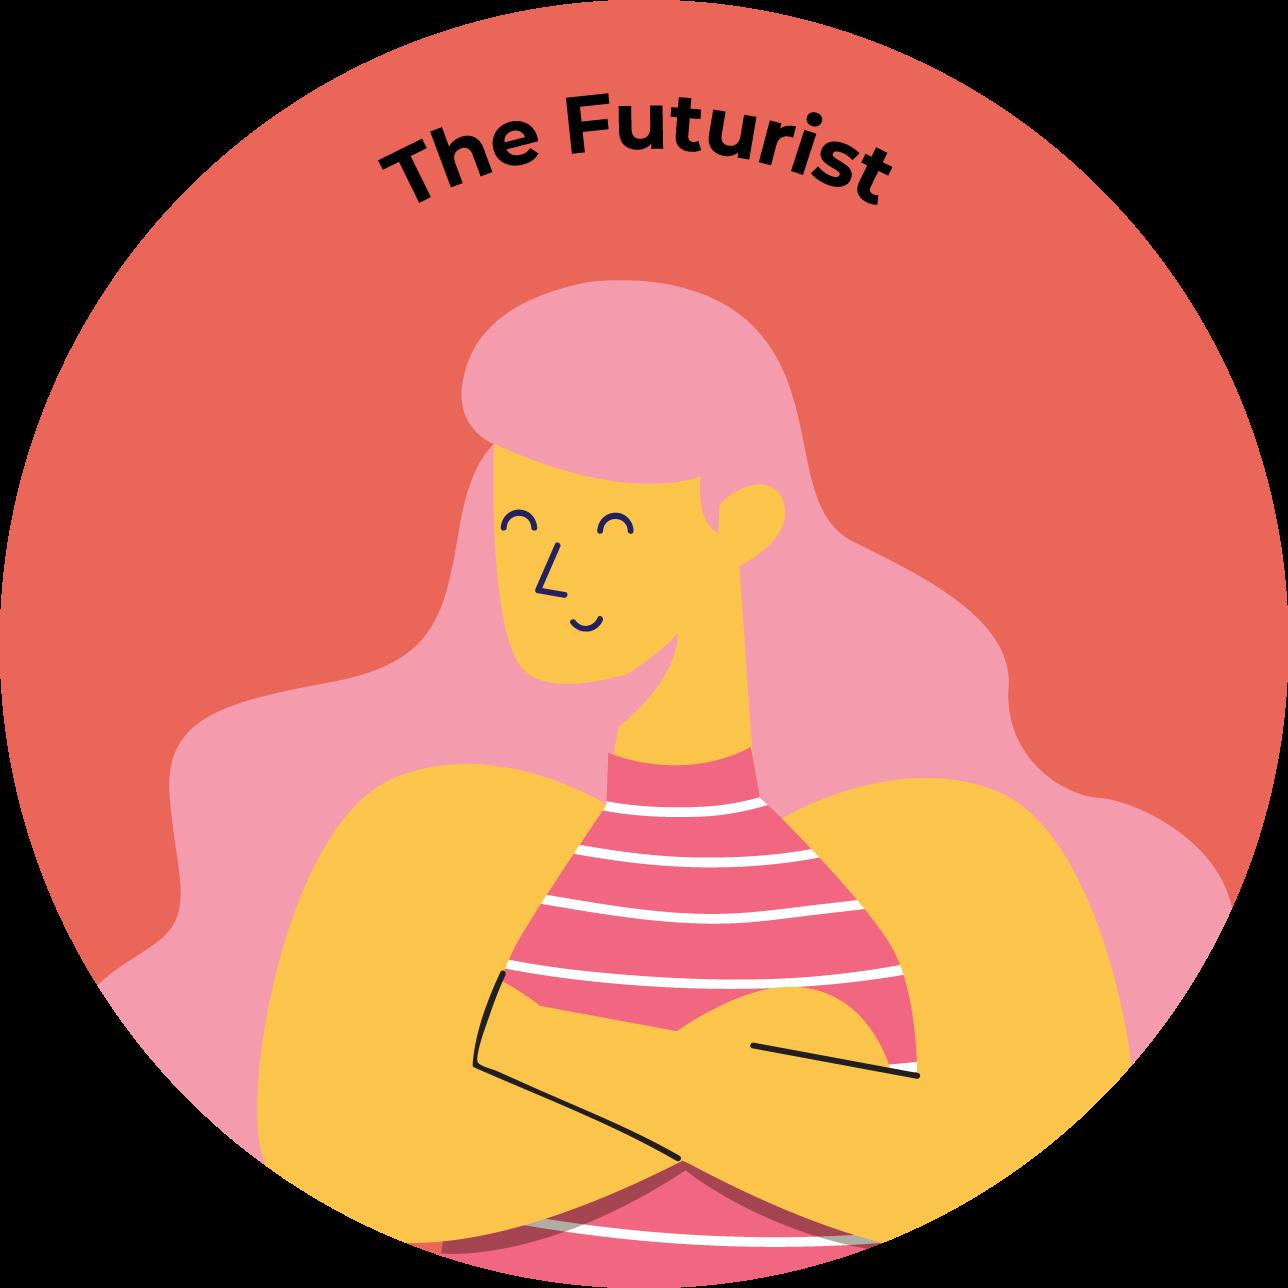 the-futurist.png